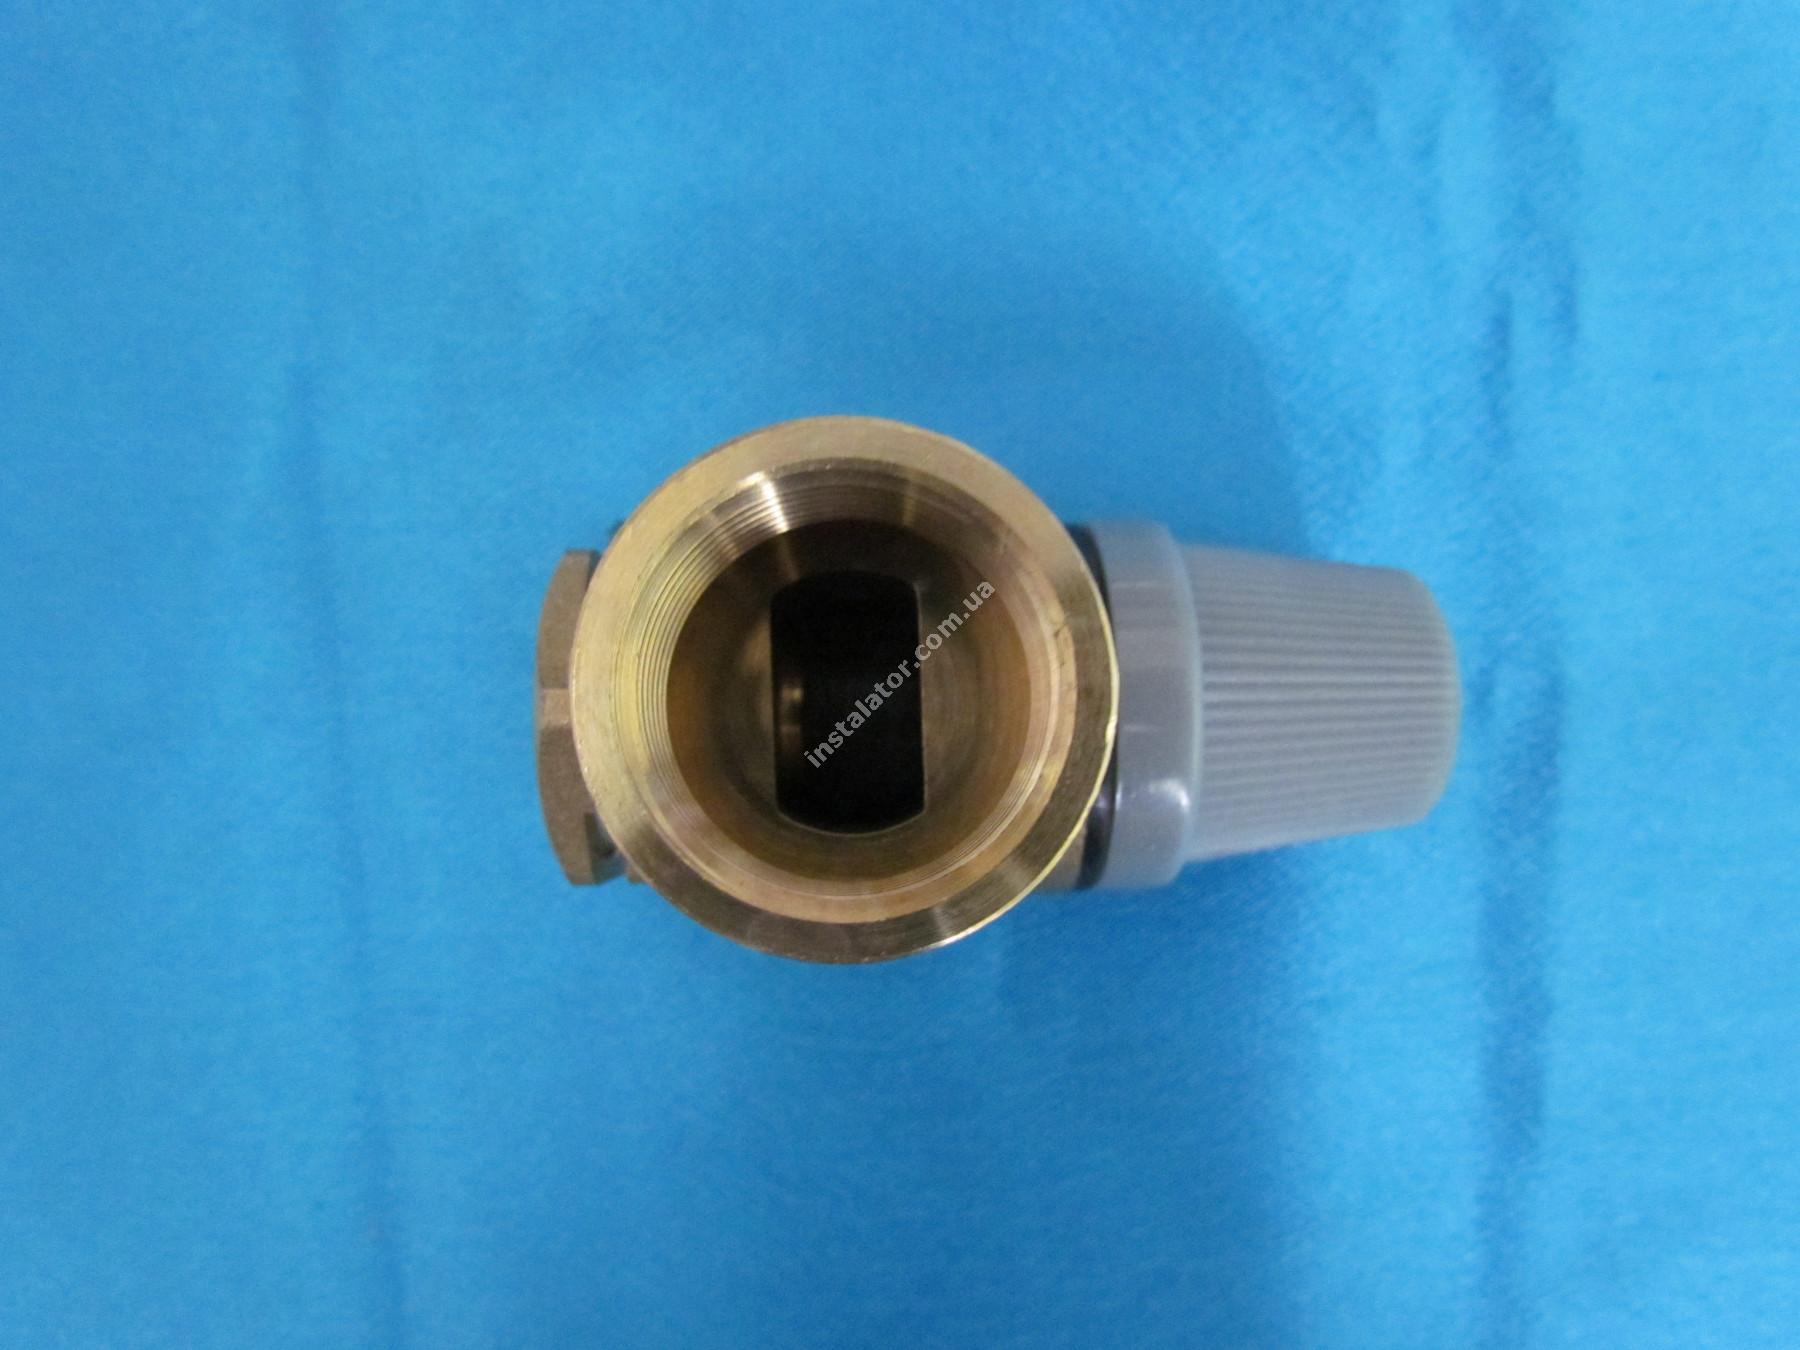 190732 Запобіжний клапан  VAILLANT Pro/Plus 3 bar full-image-0